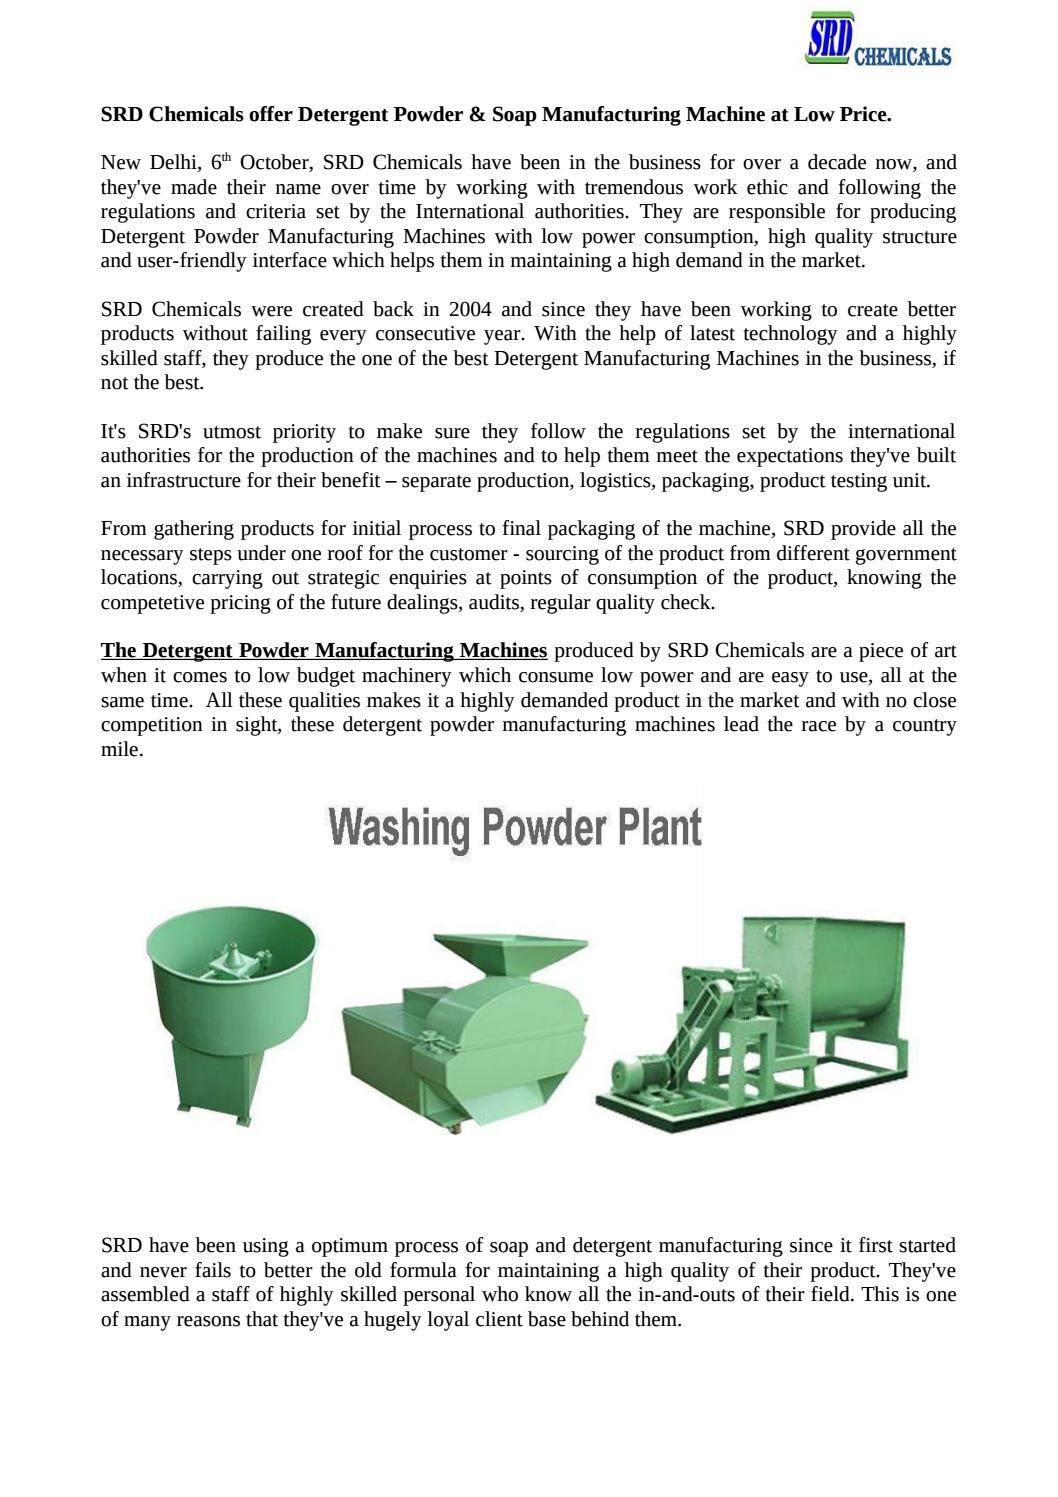 Srd chemicals offer detergent powder & soap manufacturing